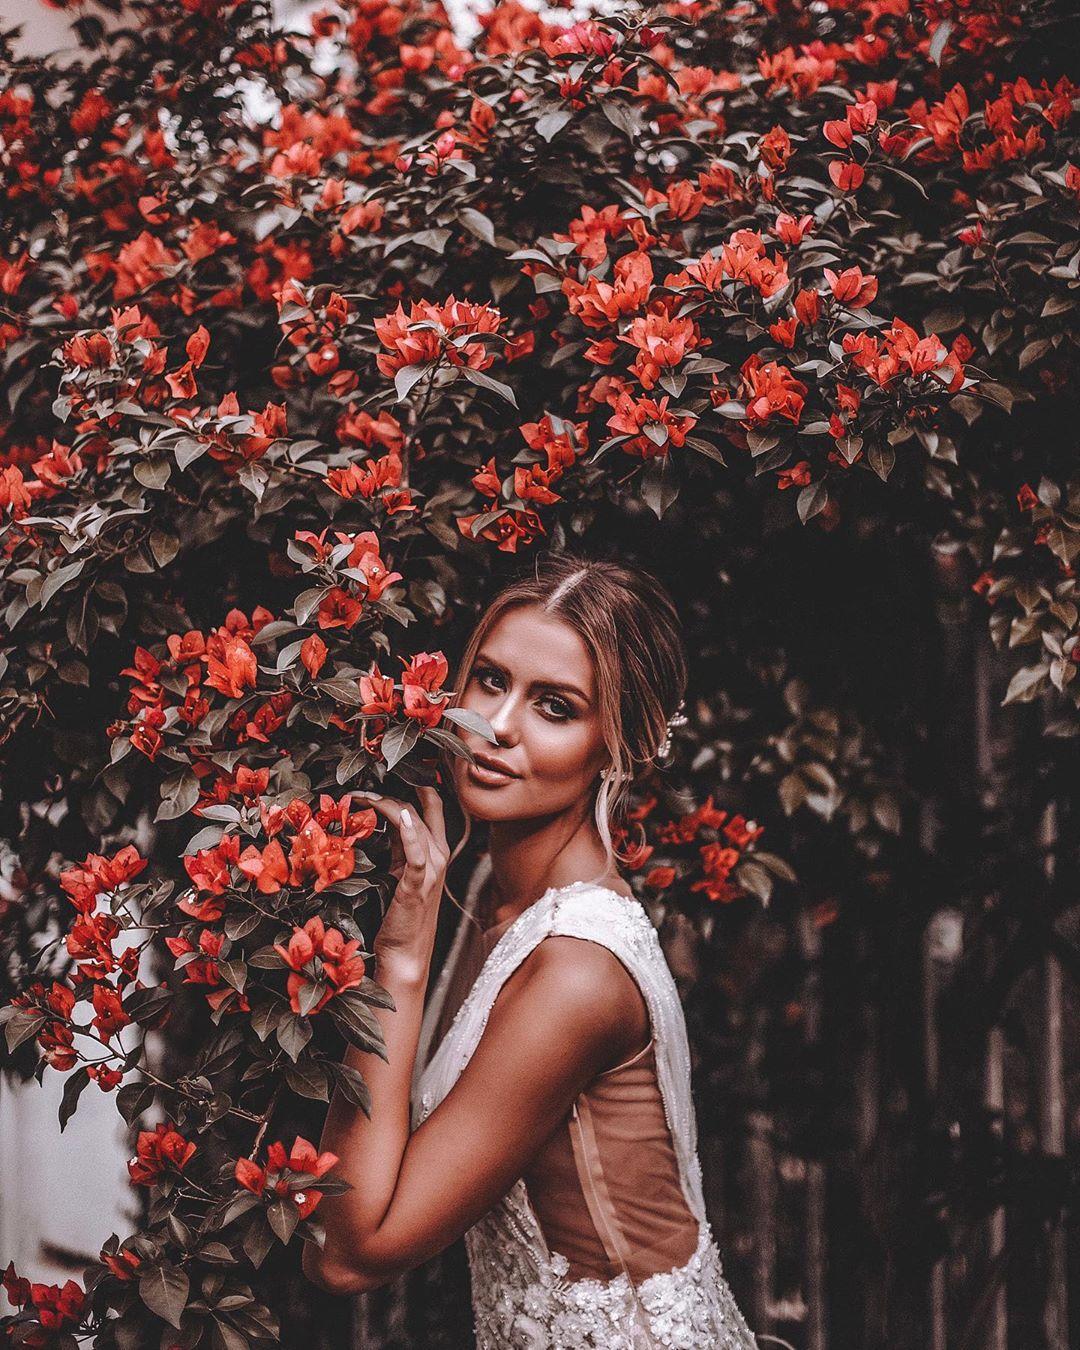 marcella kozinski de barros, 3rd runner-up de miss tourism world 2019. - Página 6 78737611